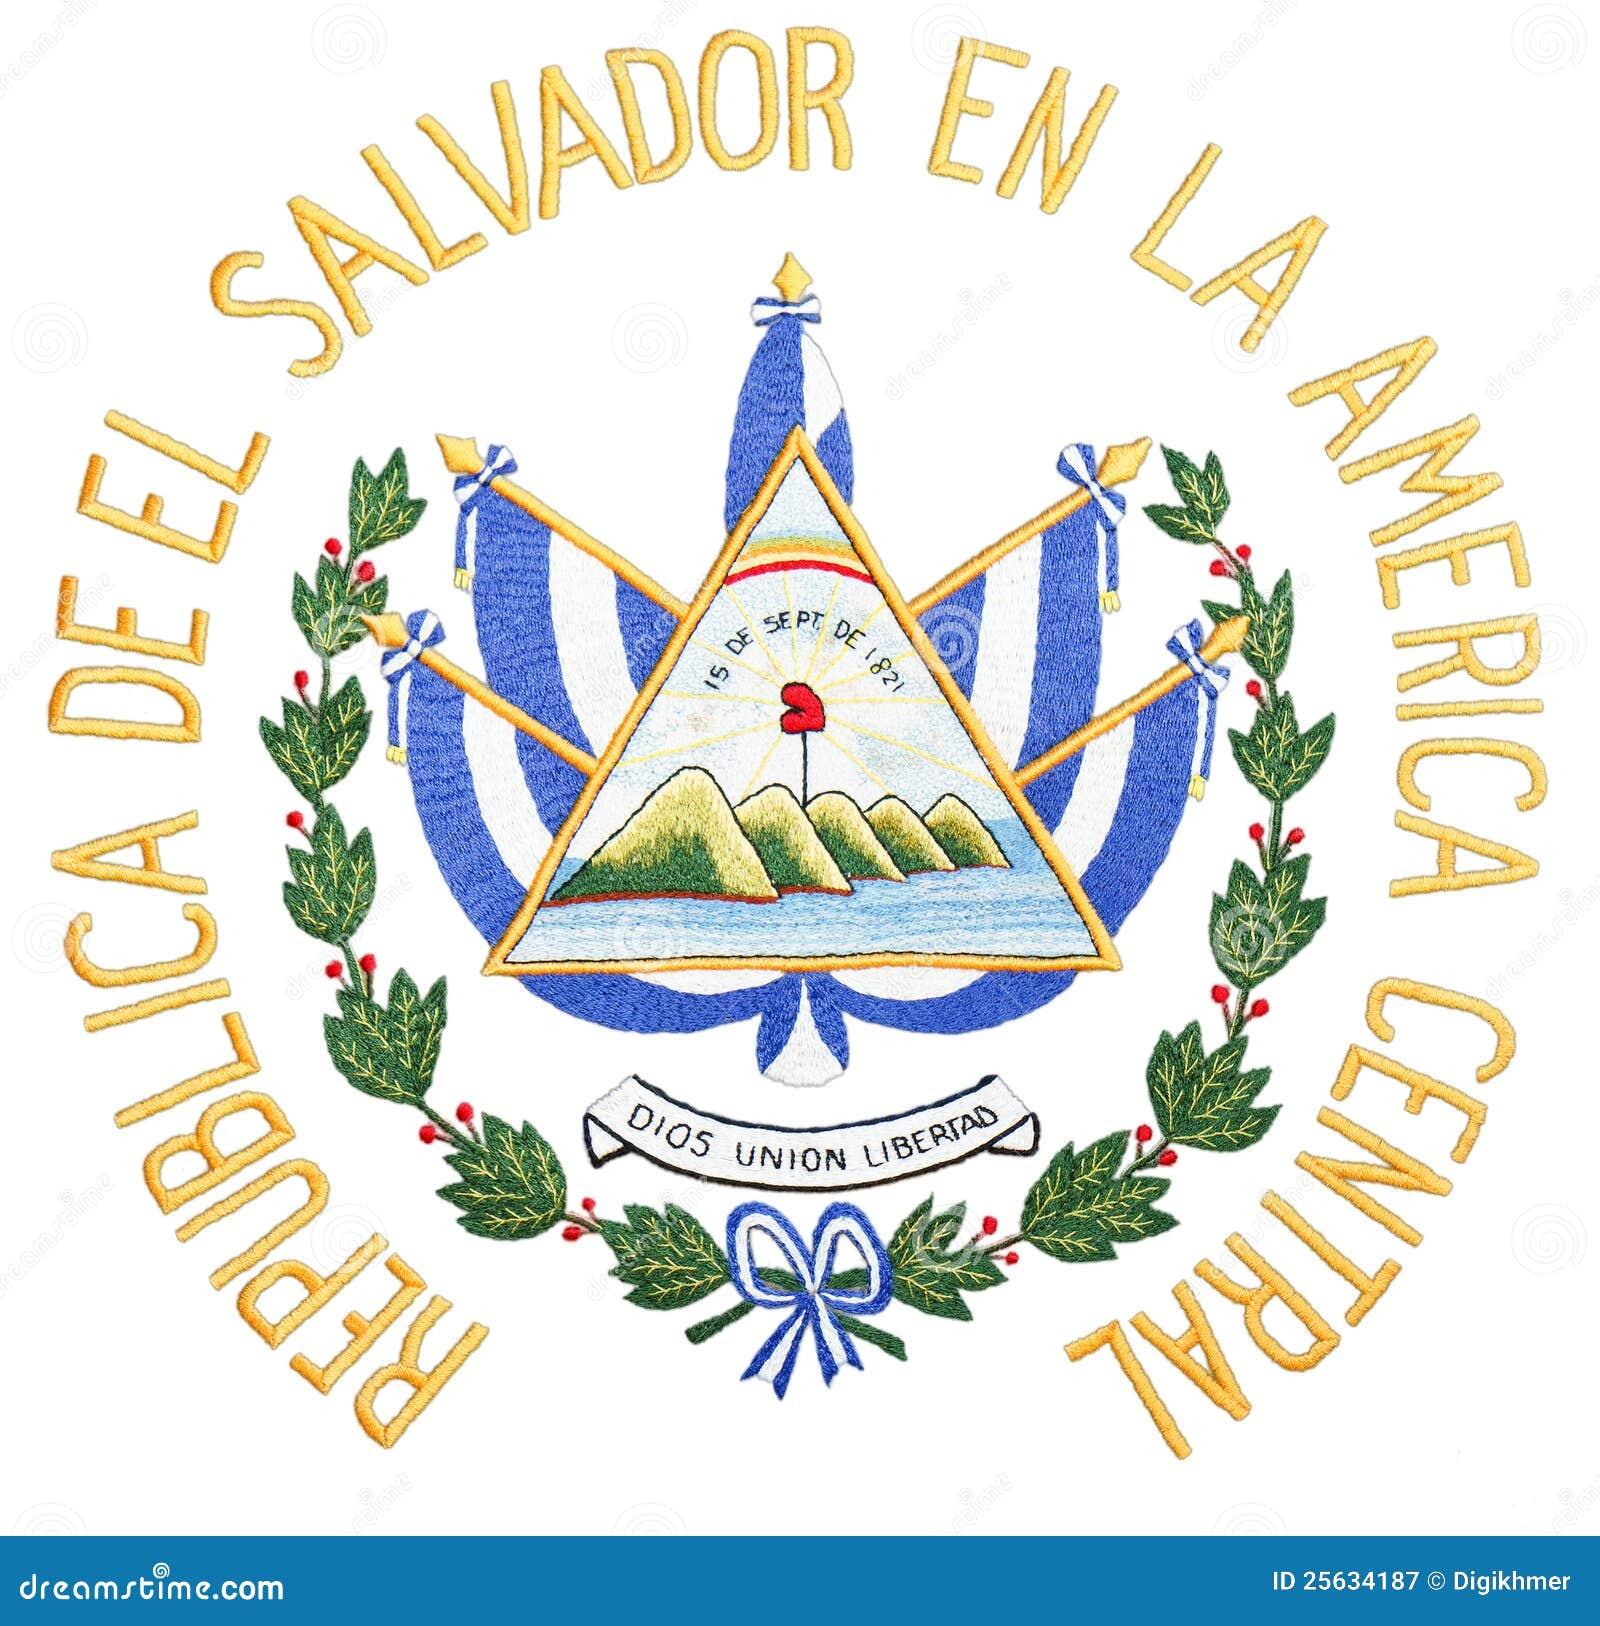 El Salvador Coat Of Arms Royalty Free Stock Photography